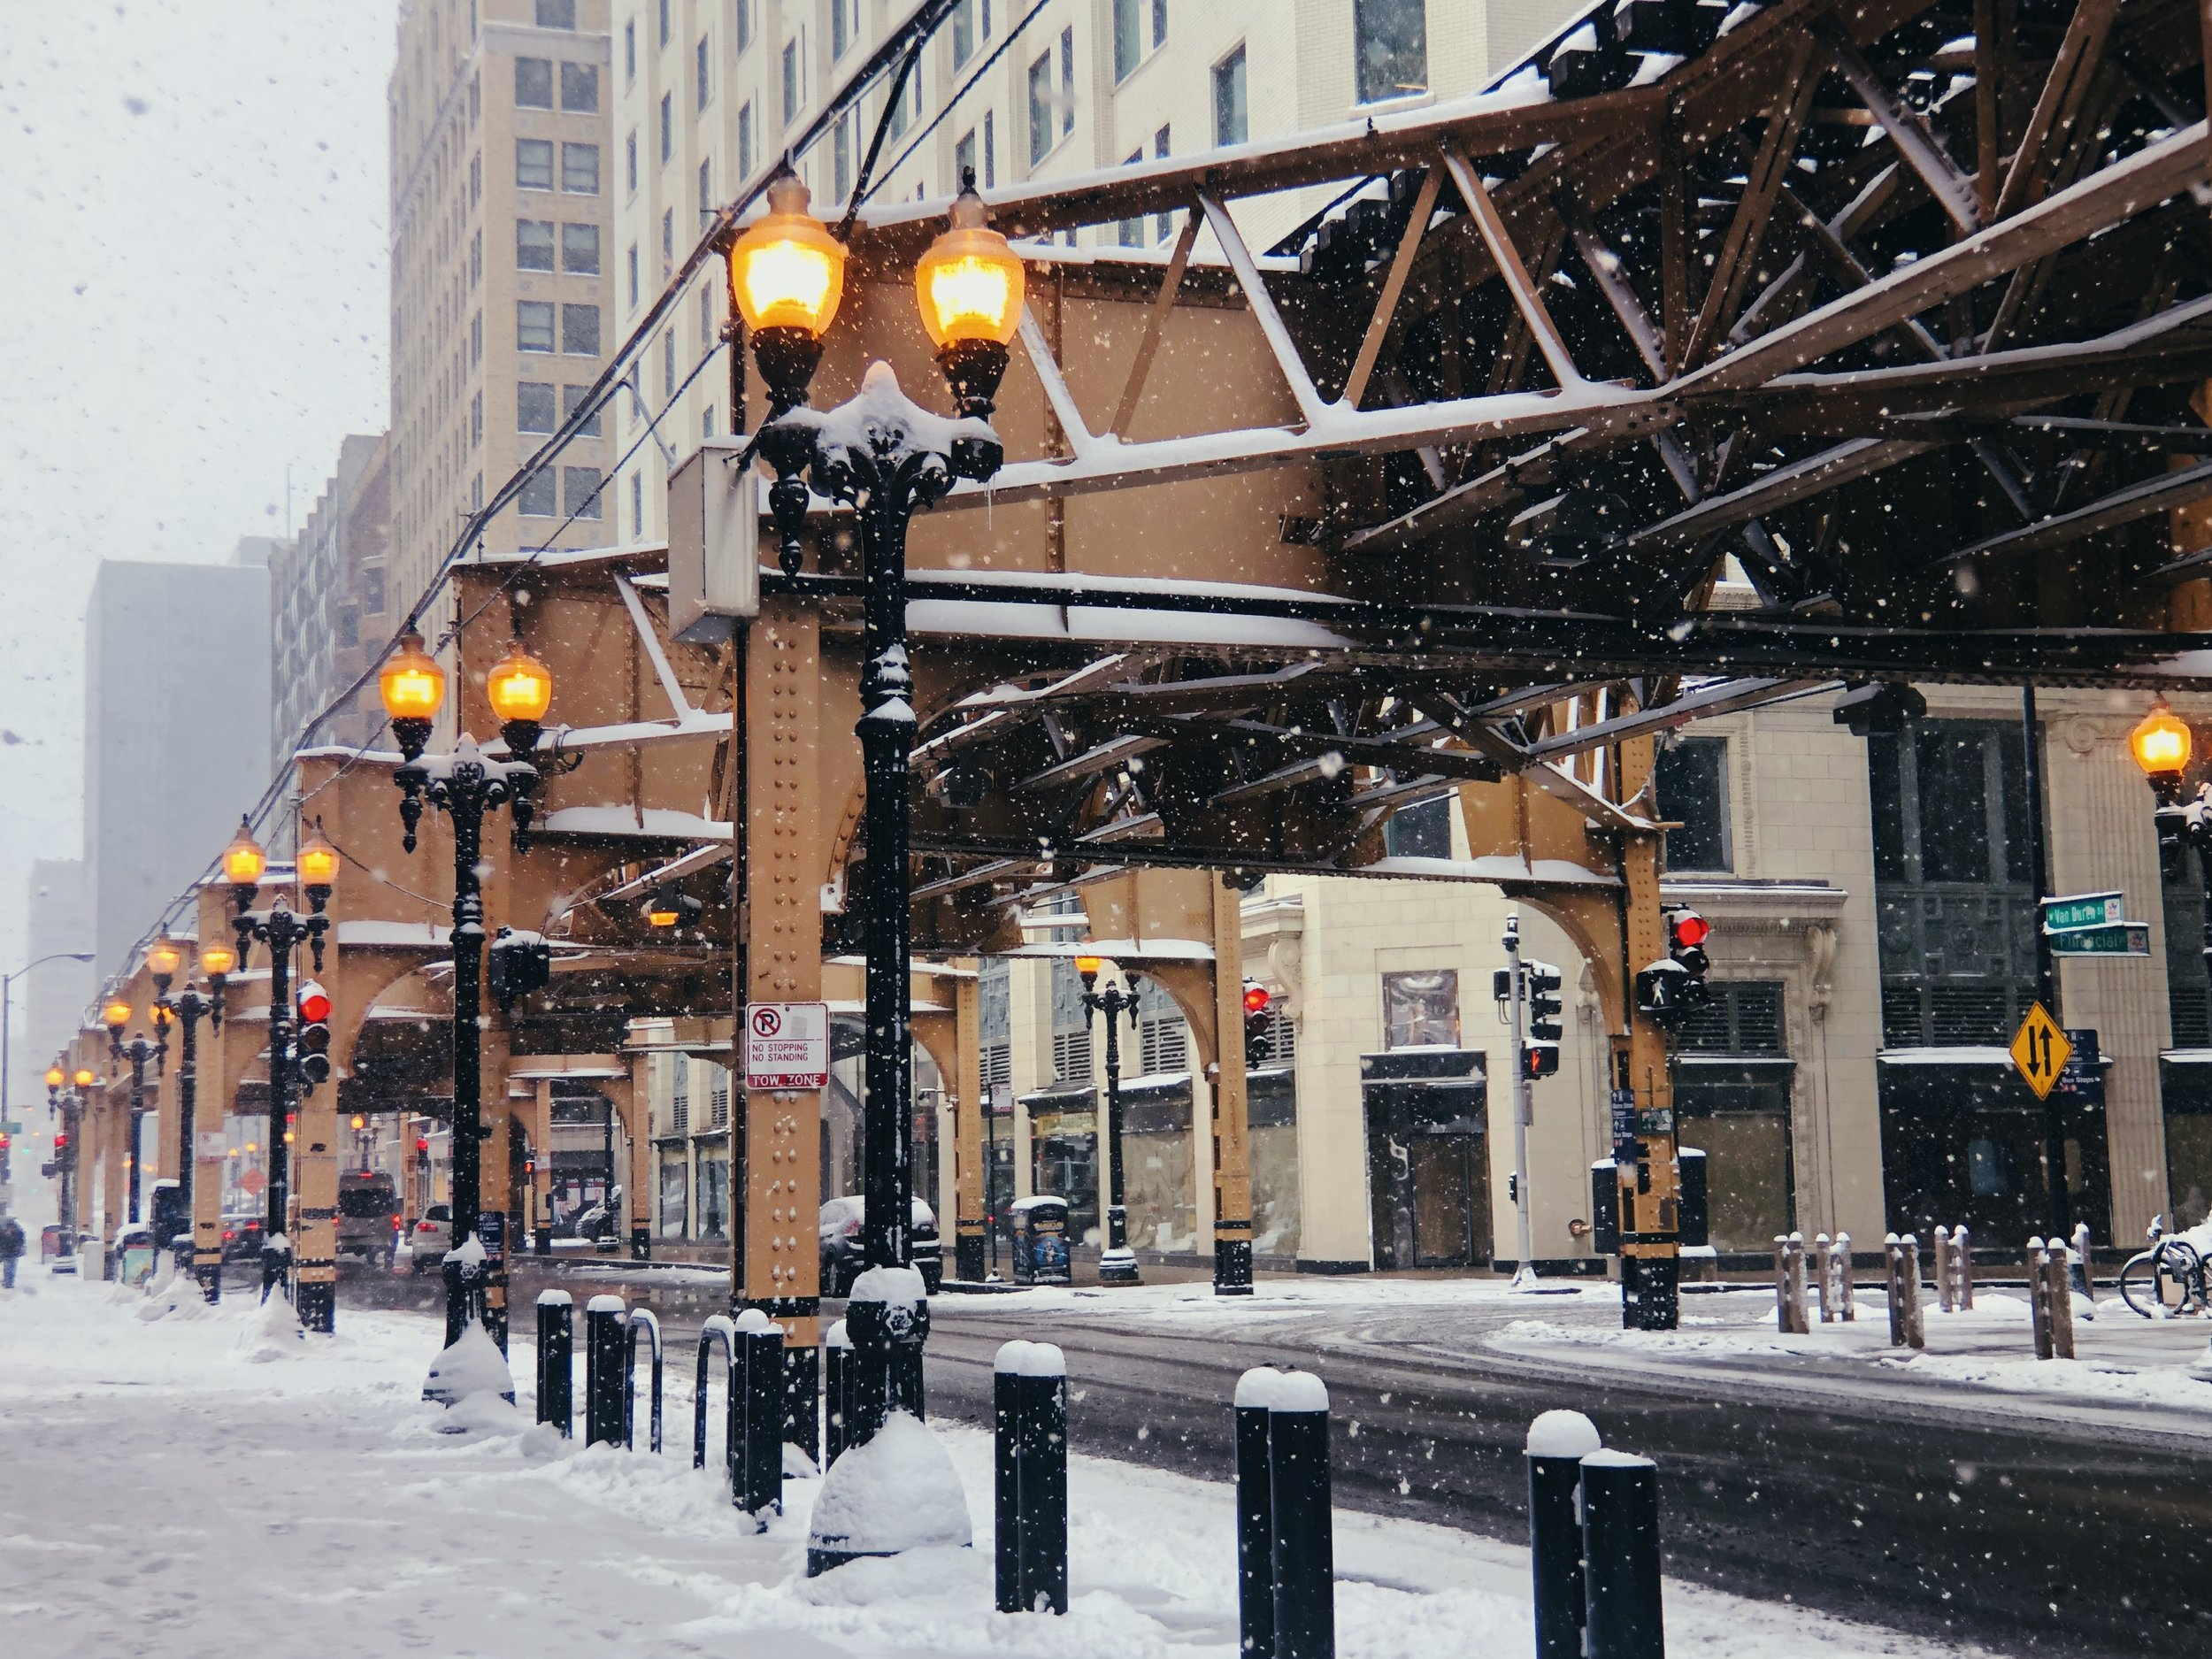 chicago-snow-kourtney-murray-12.jpg